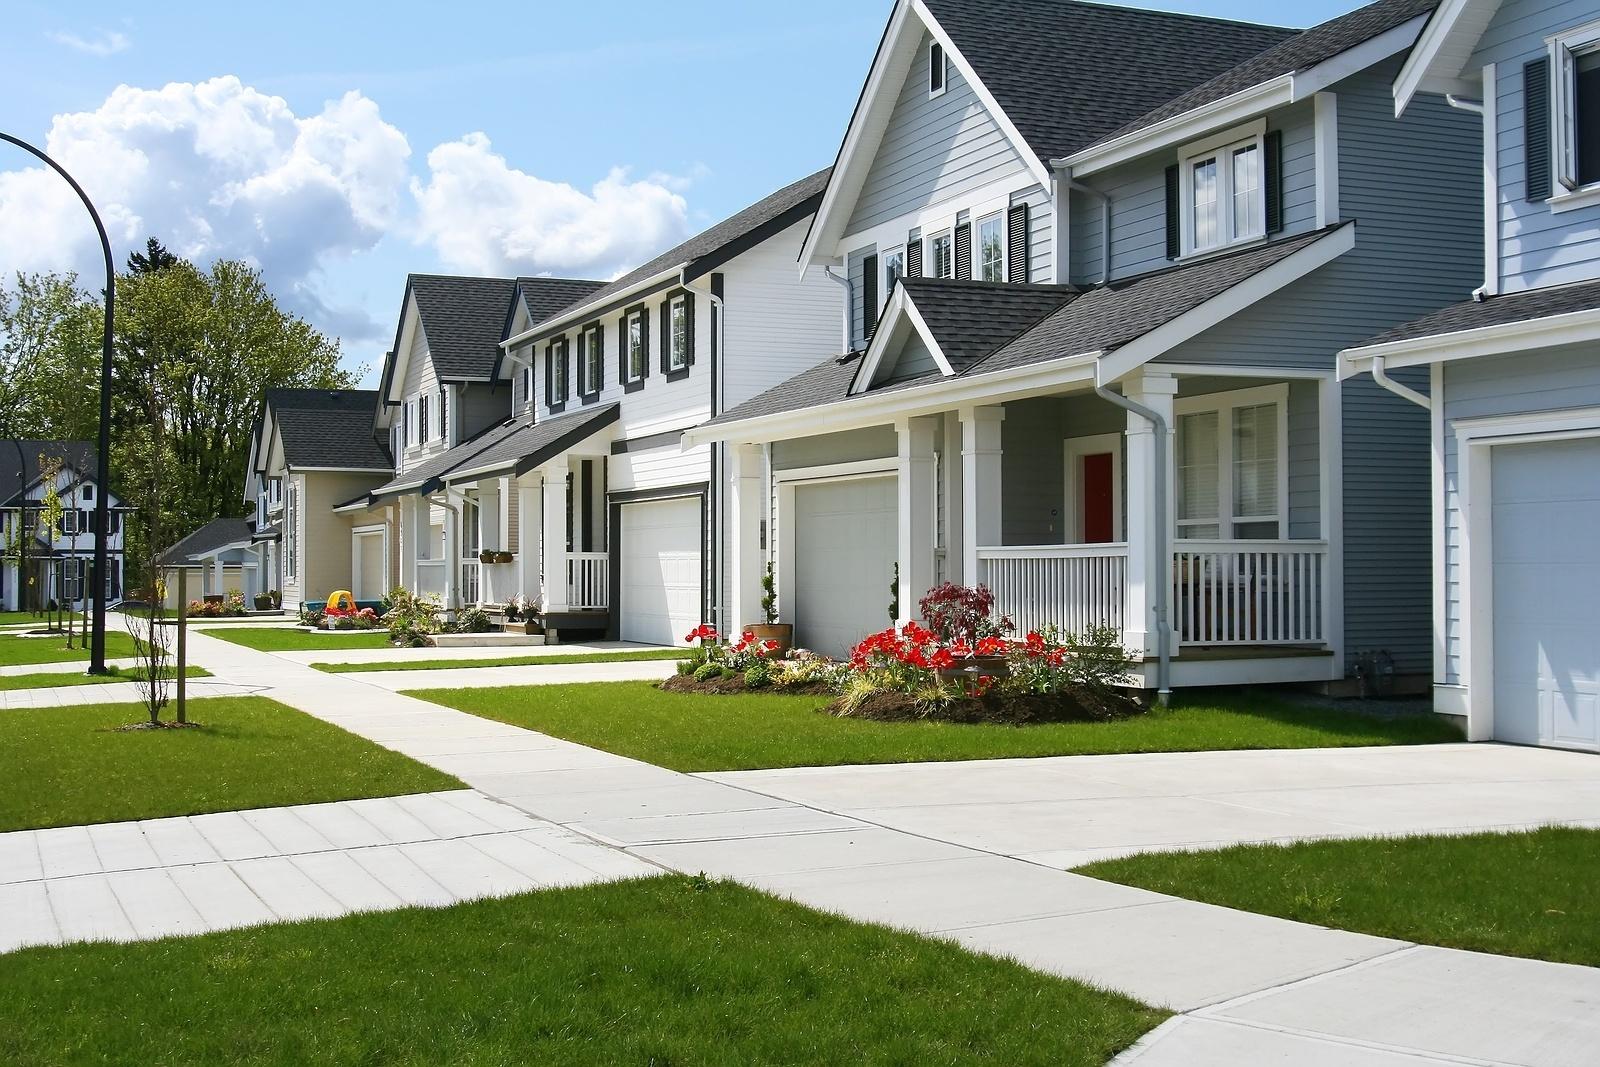 Fulton_County_property_tax-7